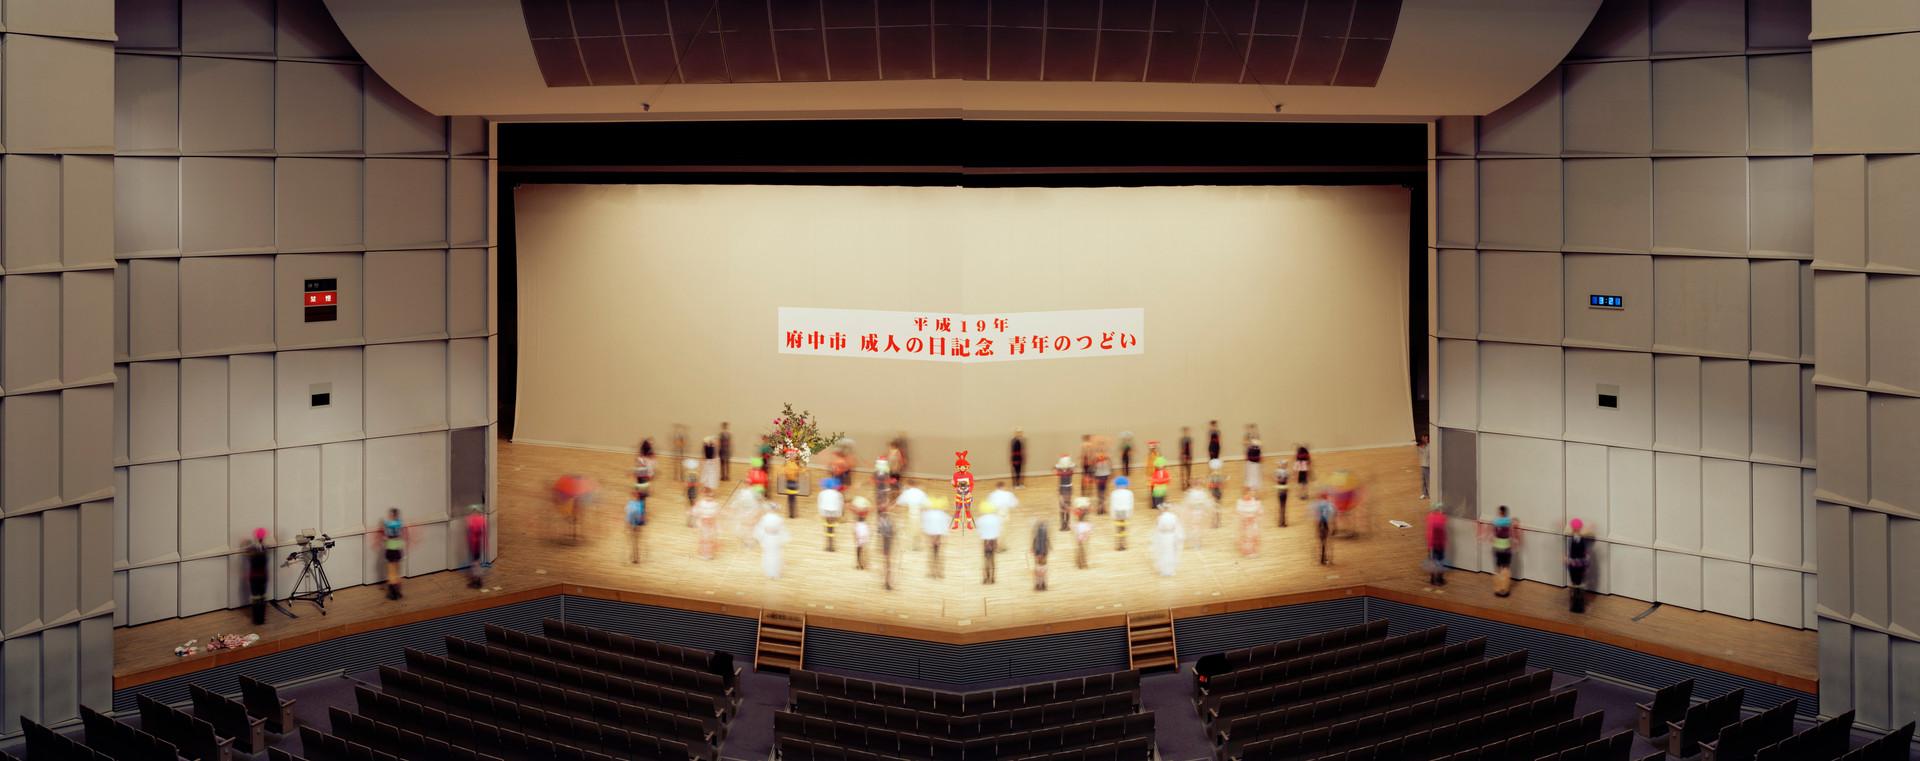 Fuchu no Mori Art Theater